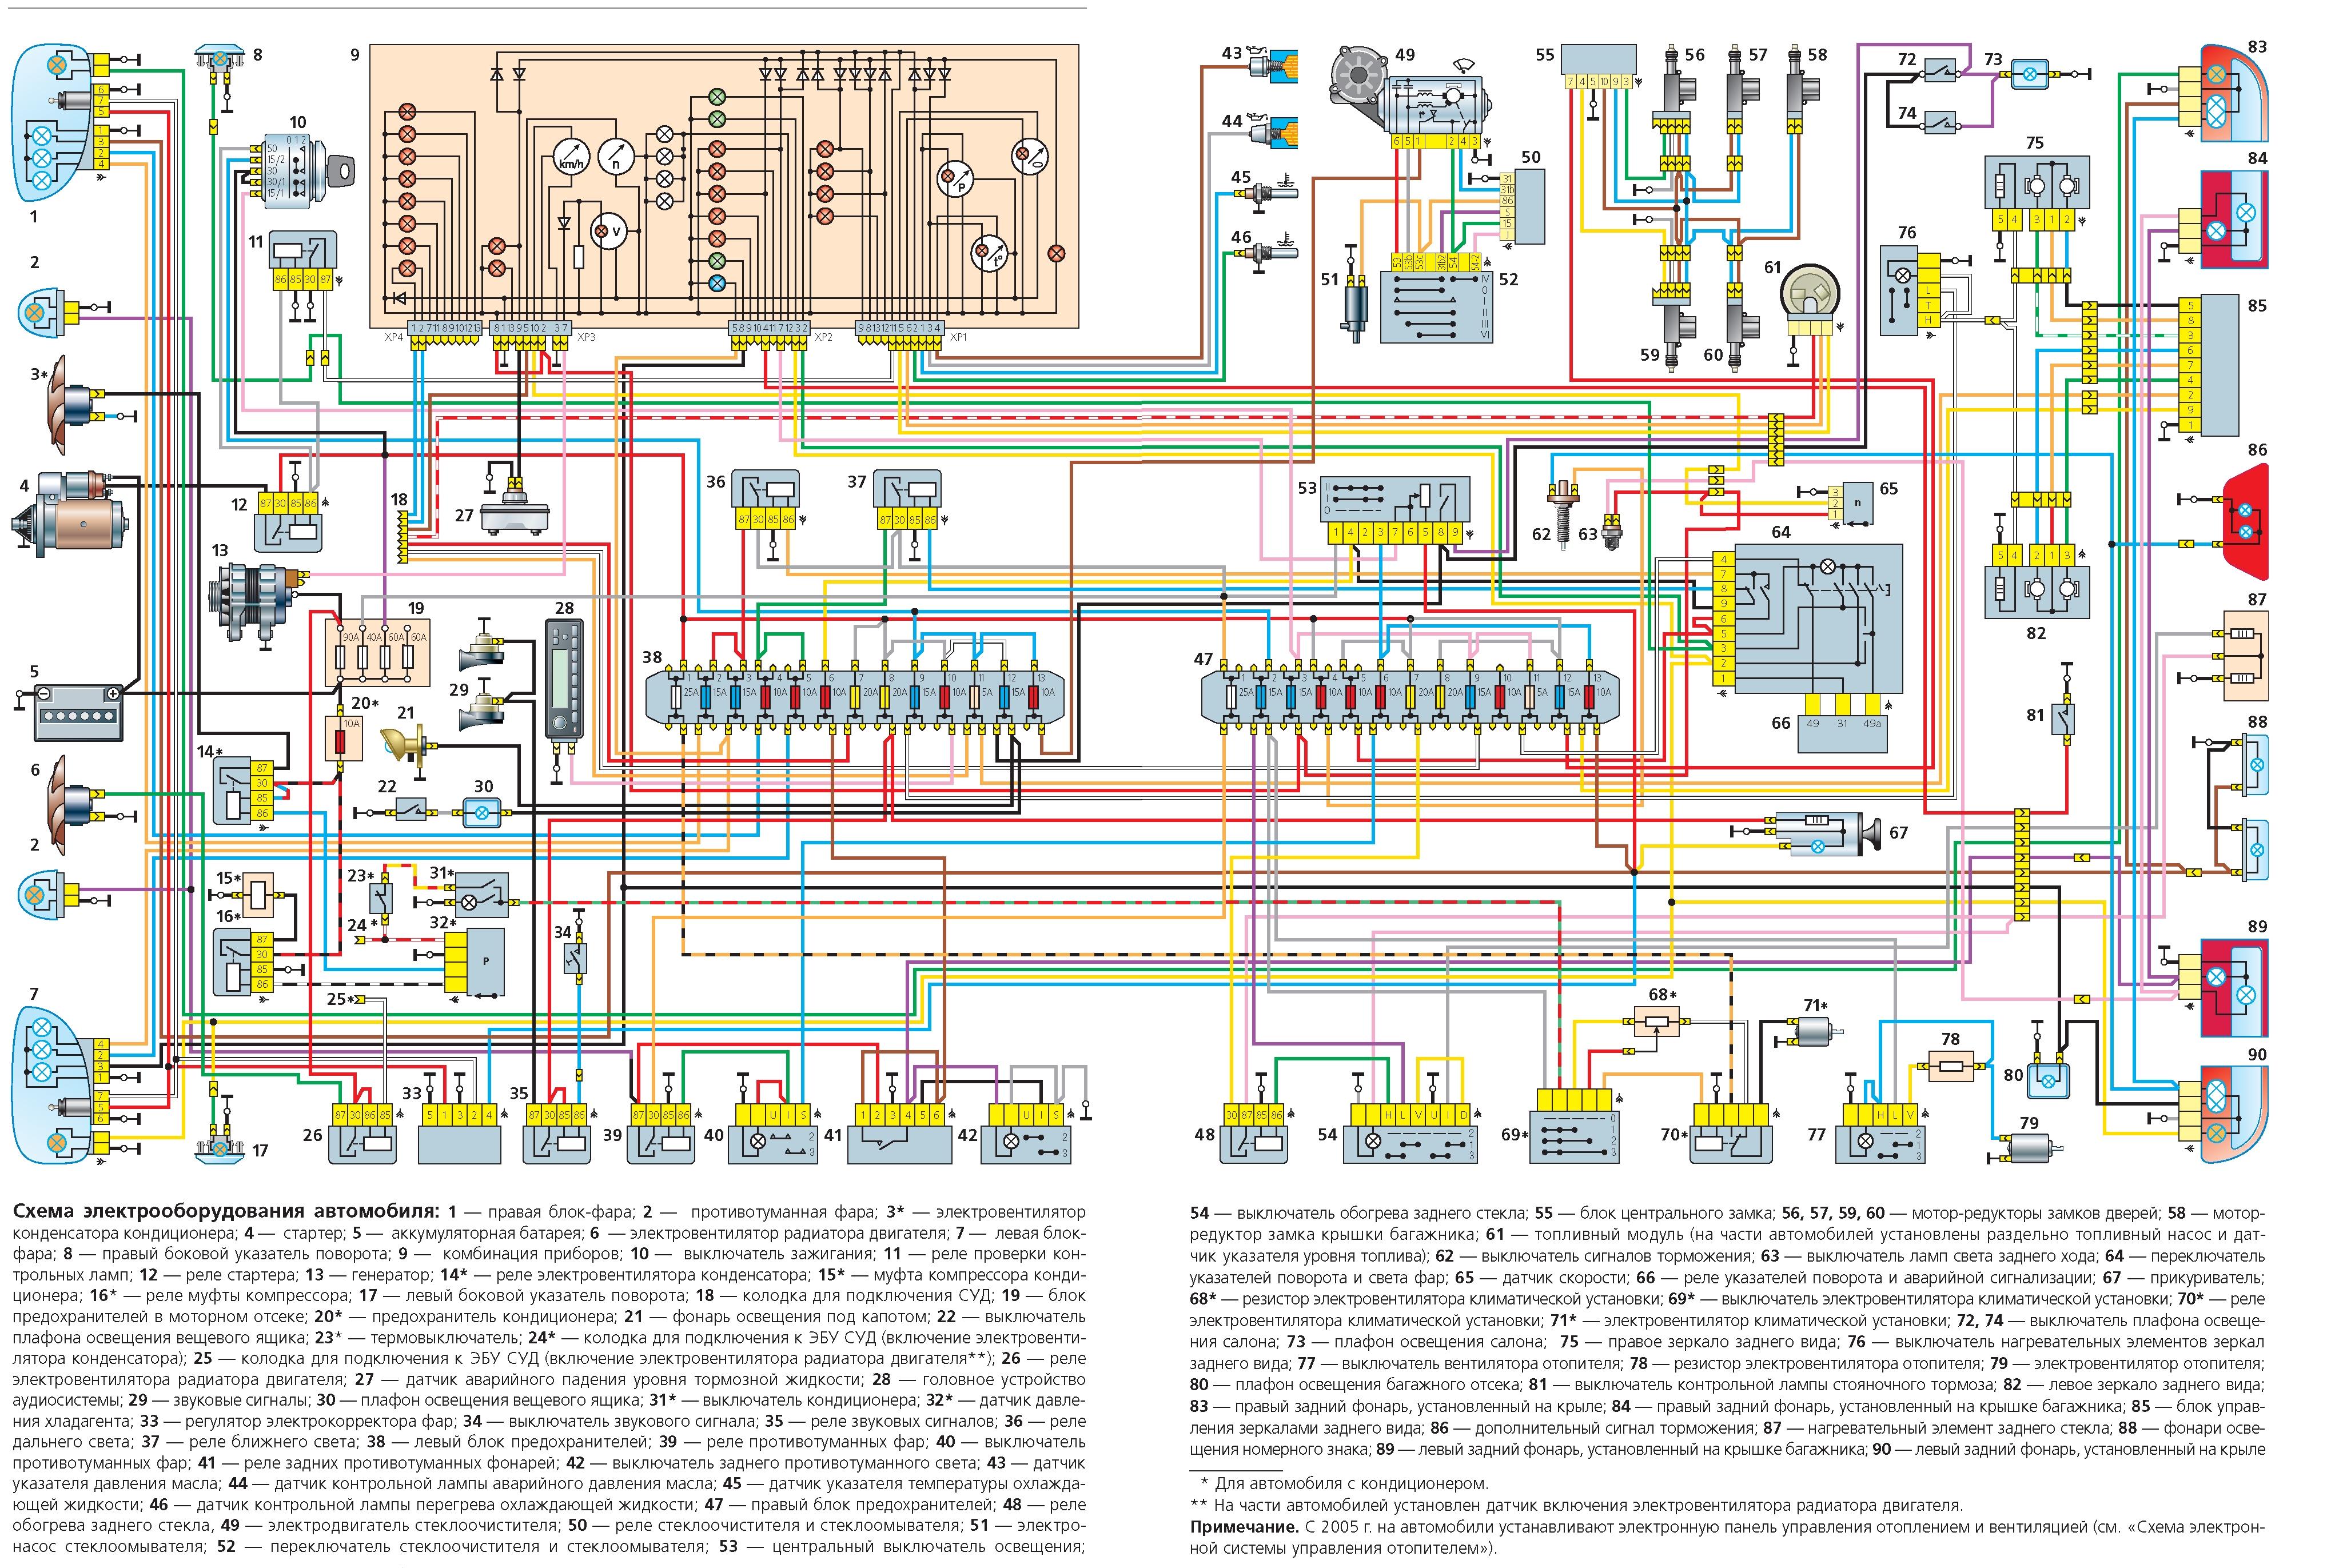 схема электрооборудования газ 40524 евро 3